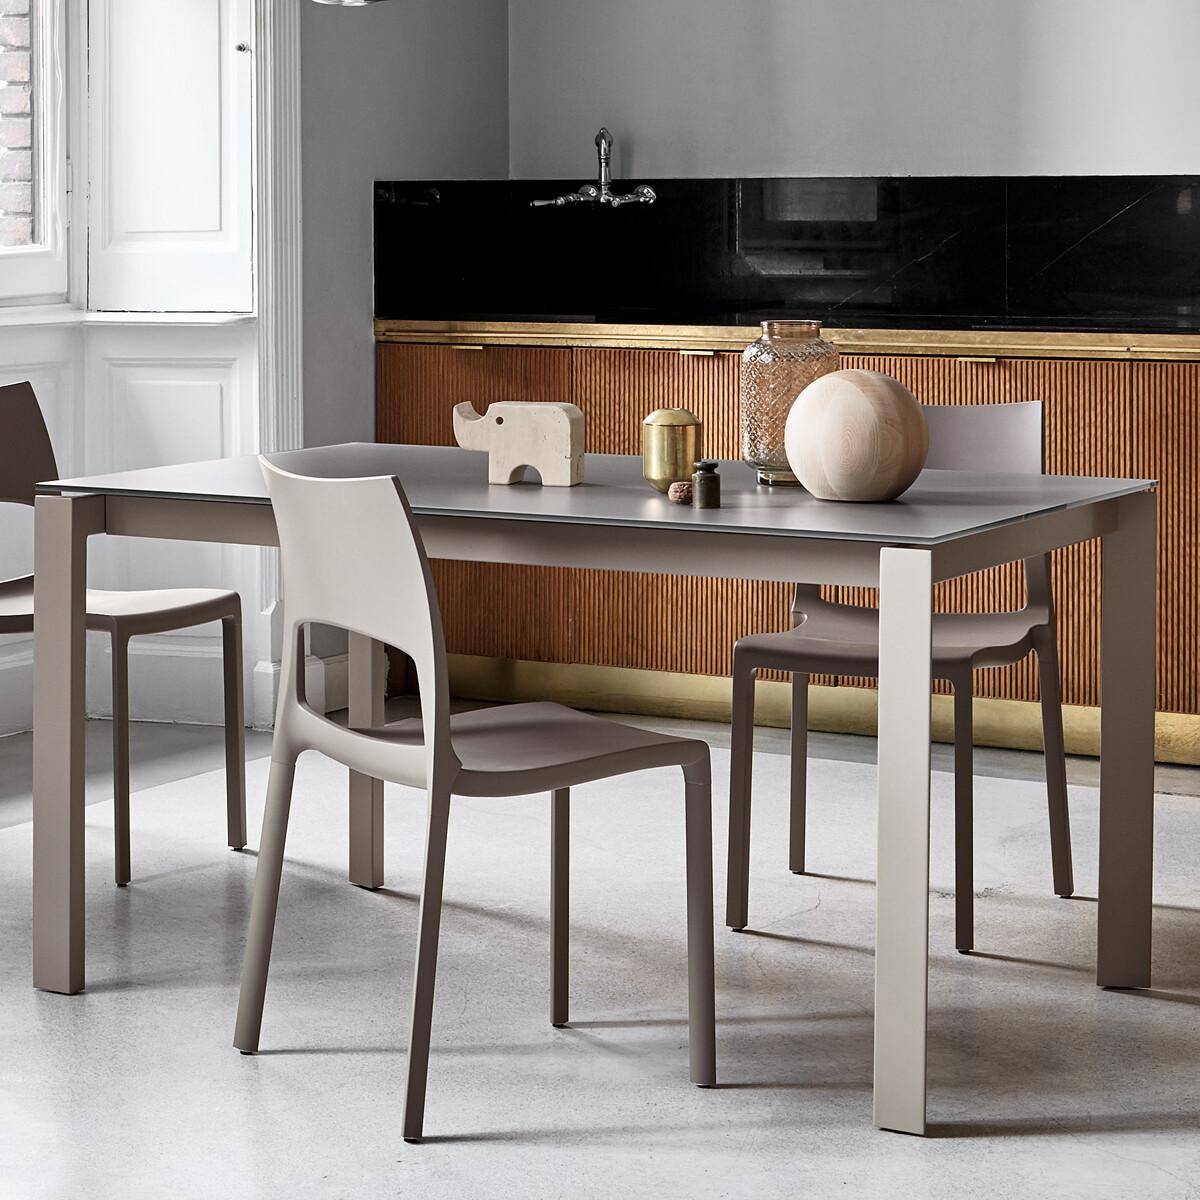 bonaldo menu ausziehbarer esstisch 140 175 210 cm casa de. Black Bedroom Furniture Sets. Home Design Ideas